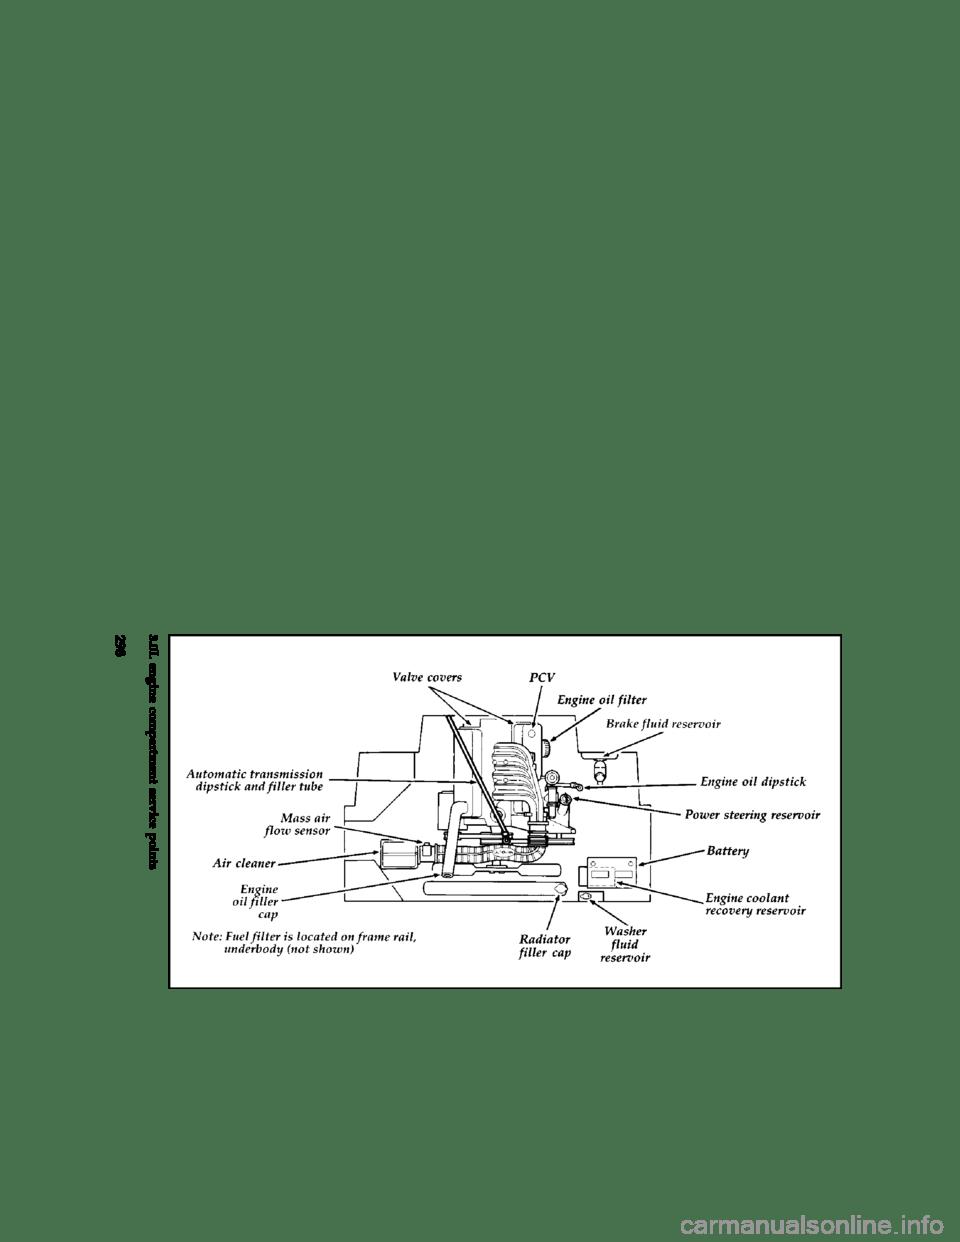 medium resolution of ford aerostar 1997 1 g owners manual